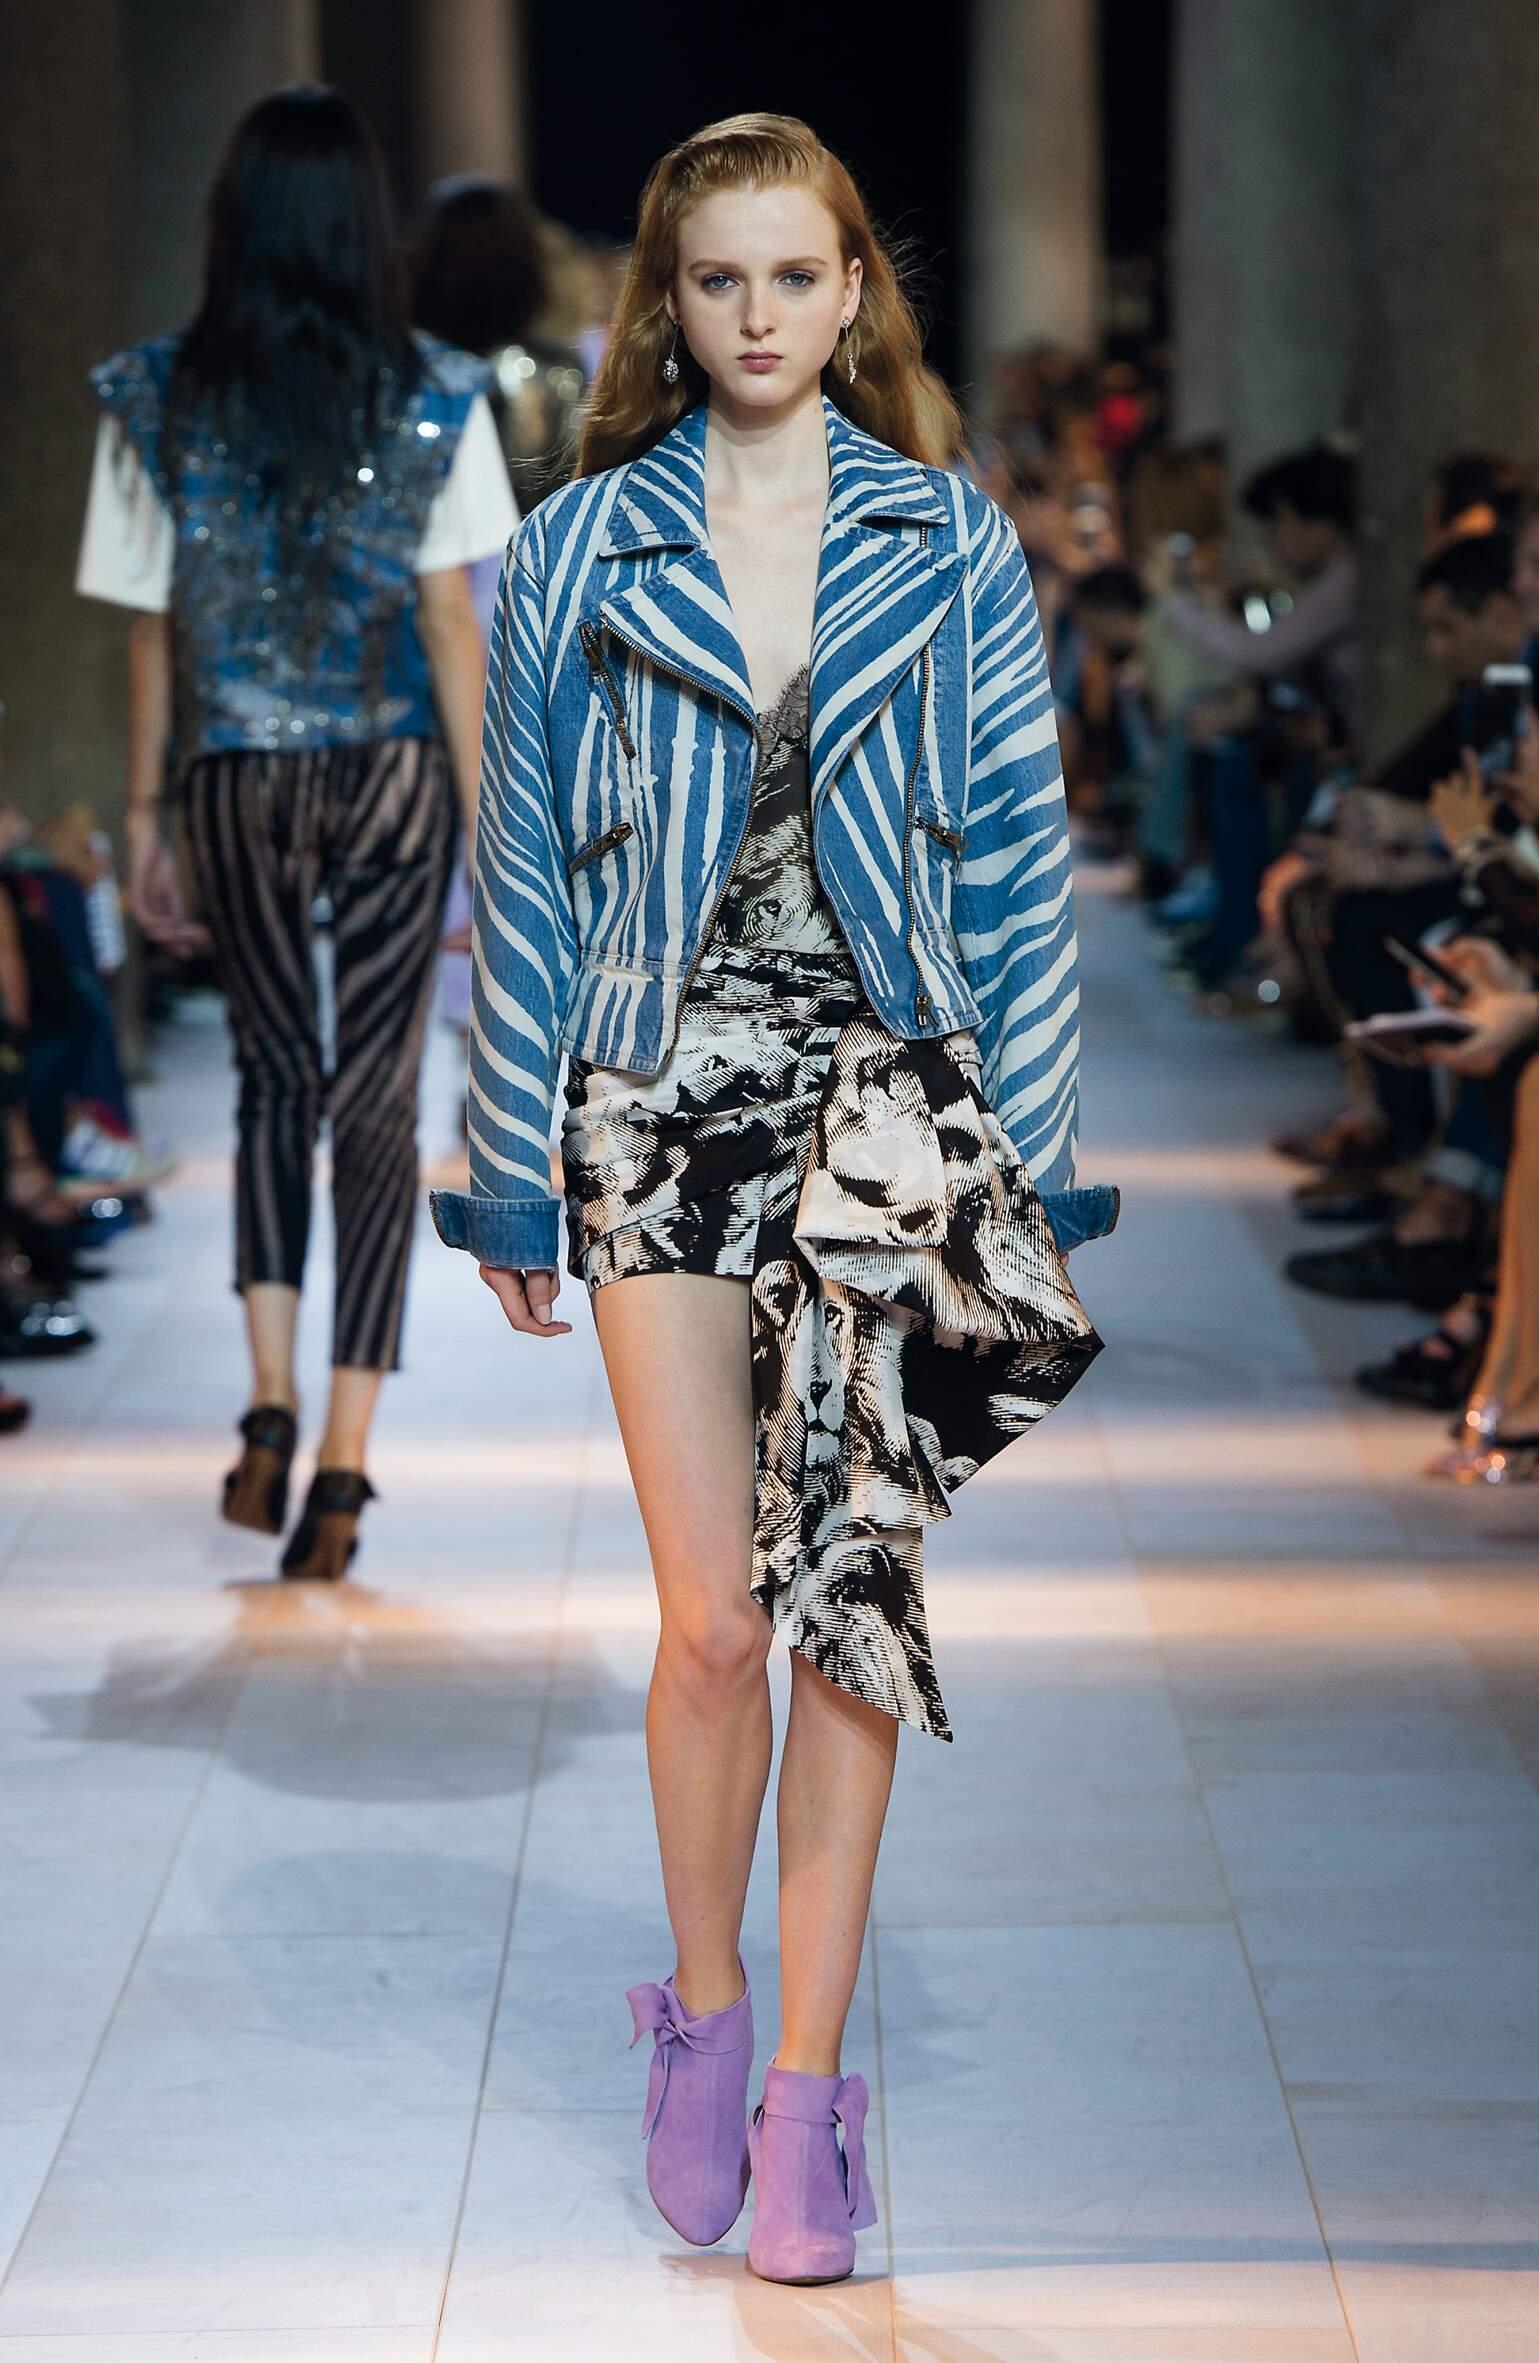 Fashion Model Roberto Cavalli Catwalk